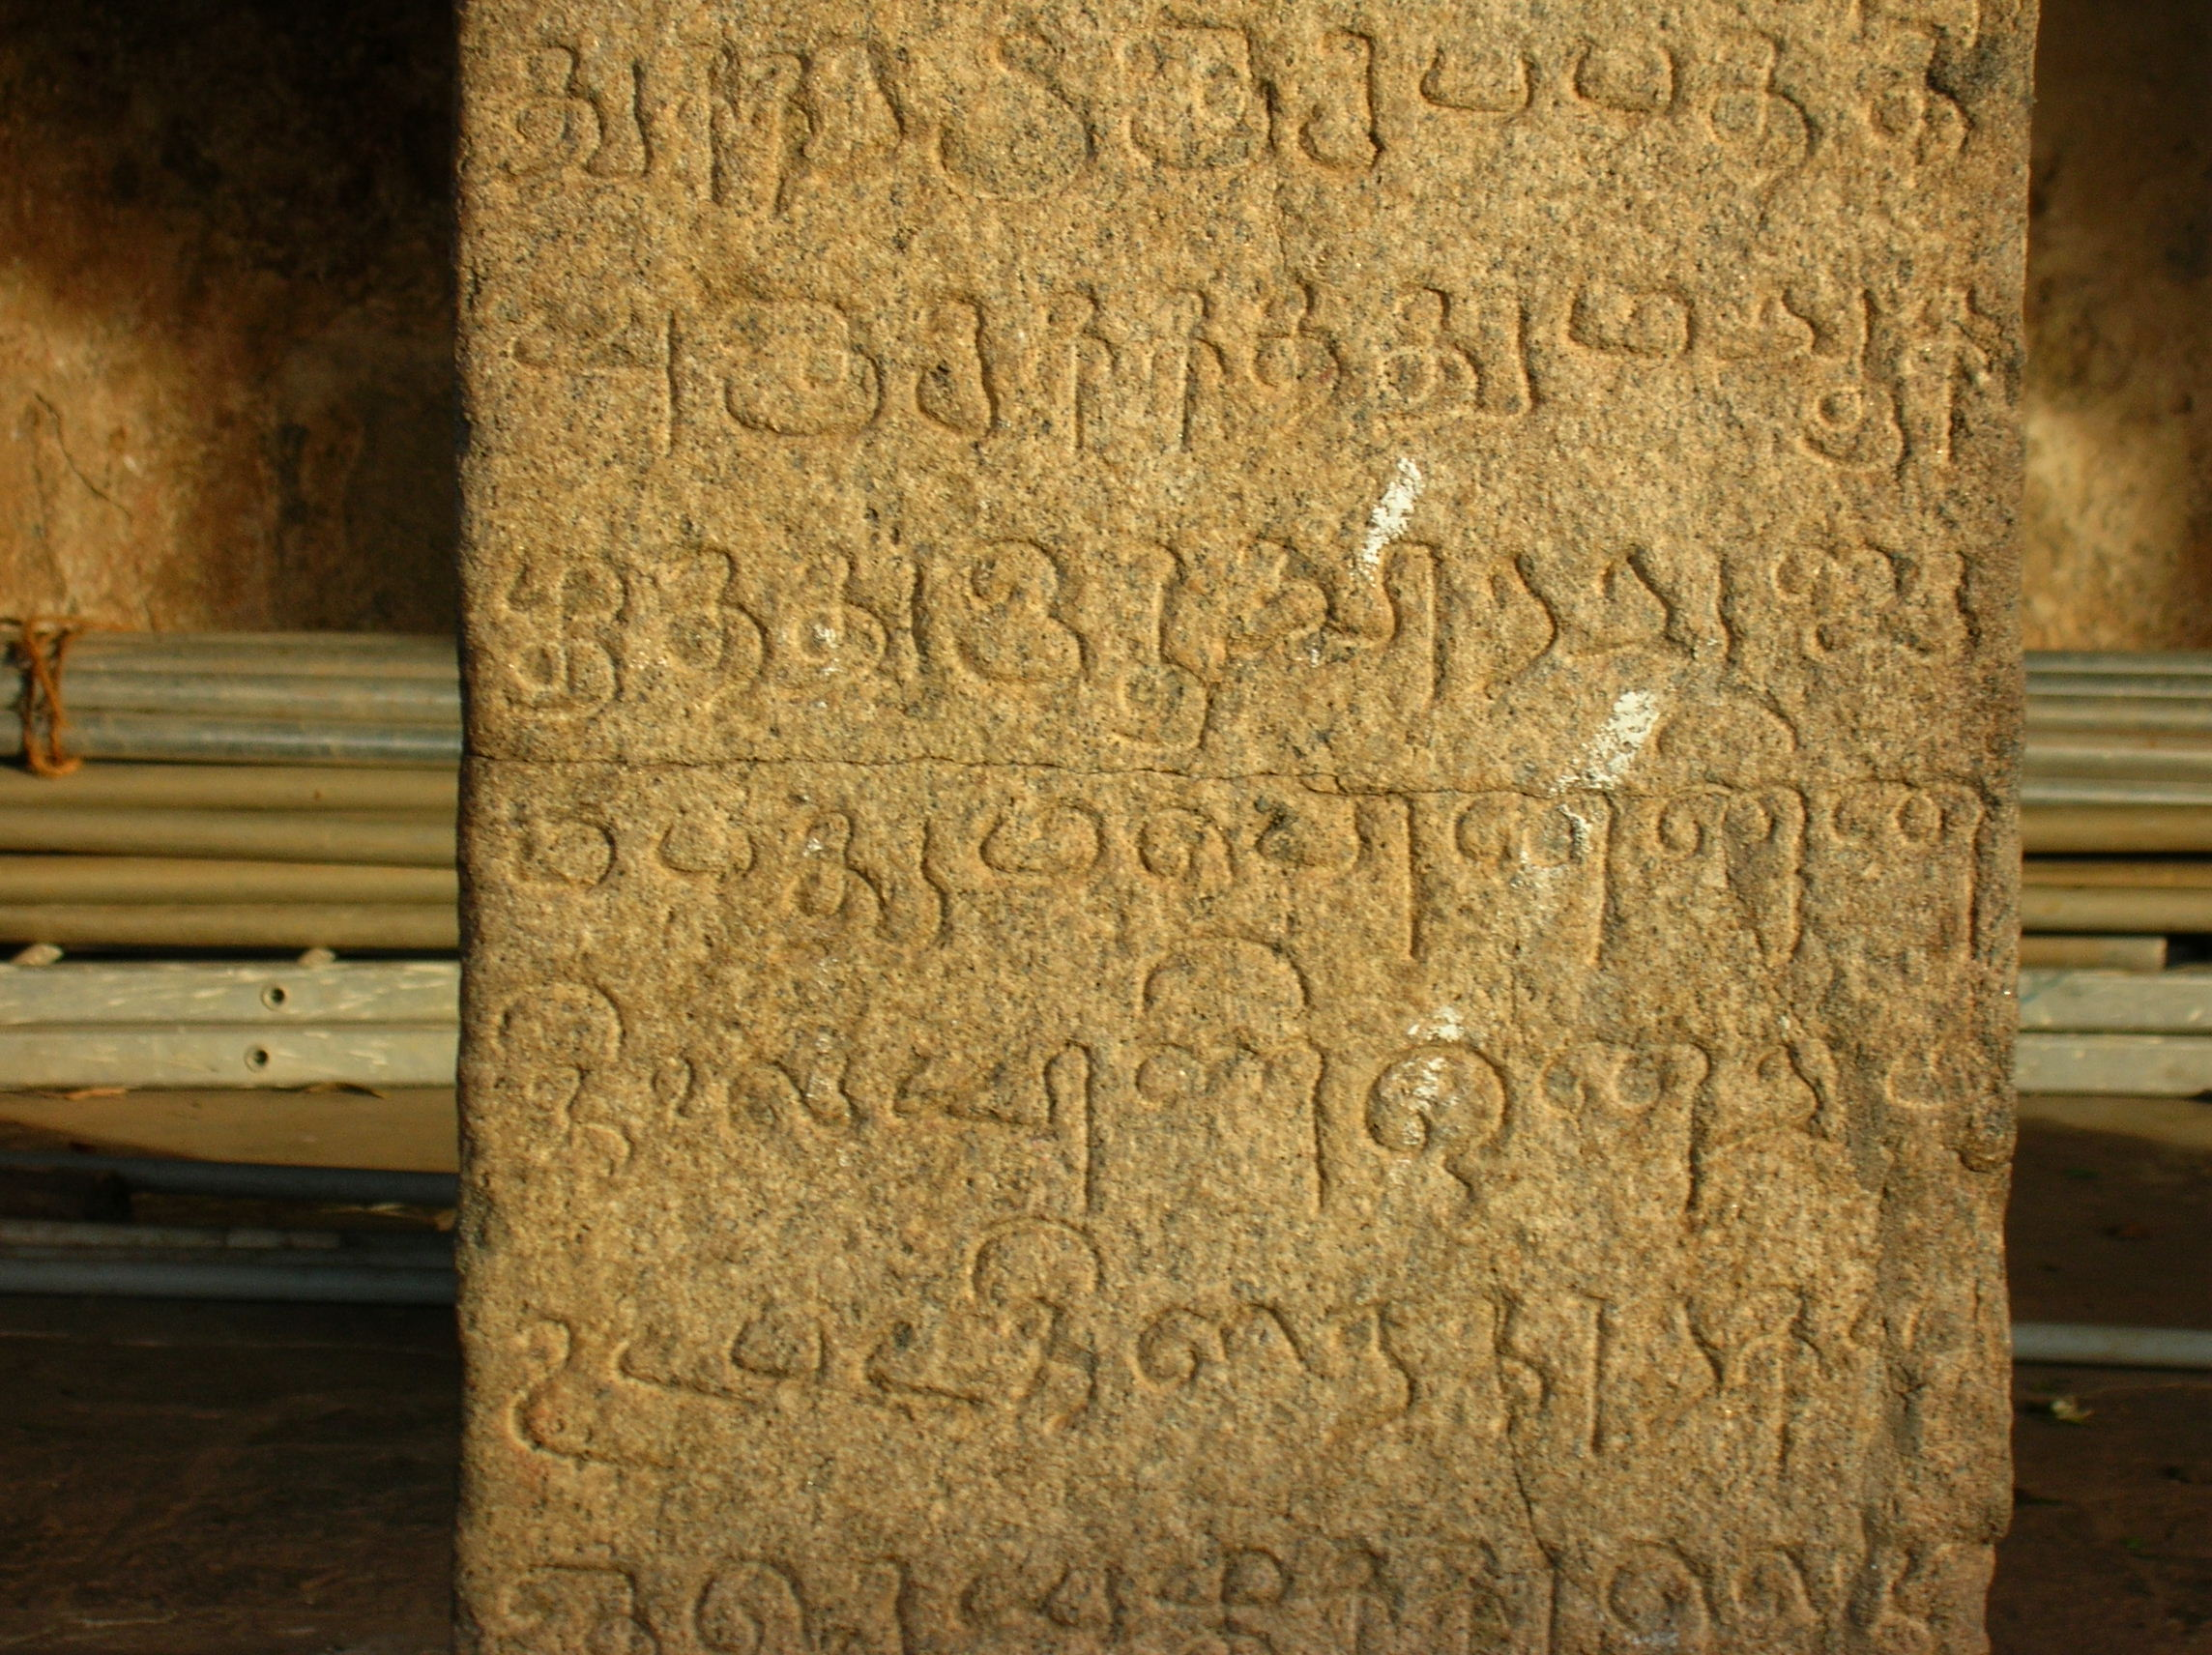 Indian Inscriptions